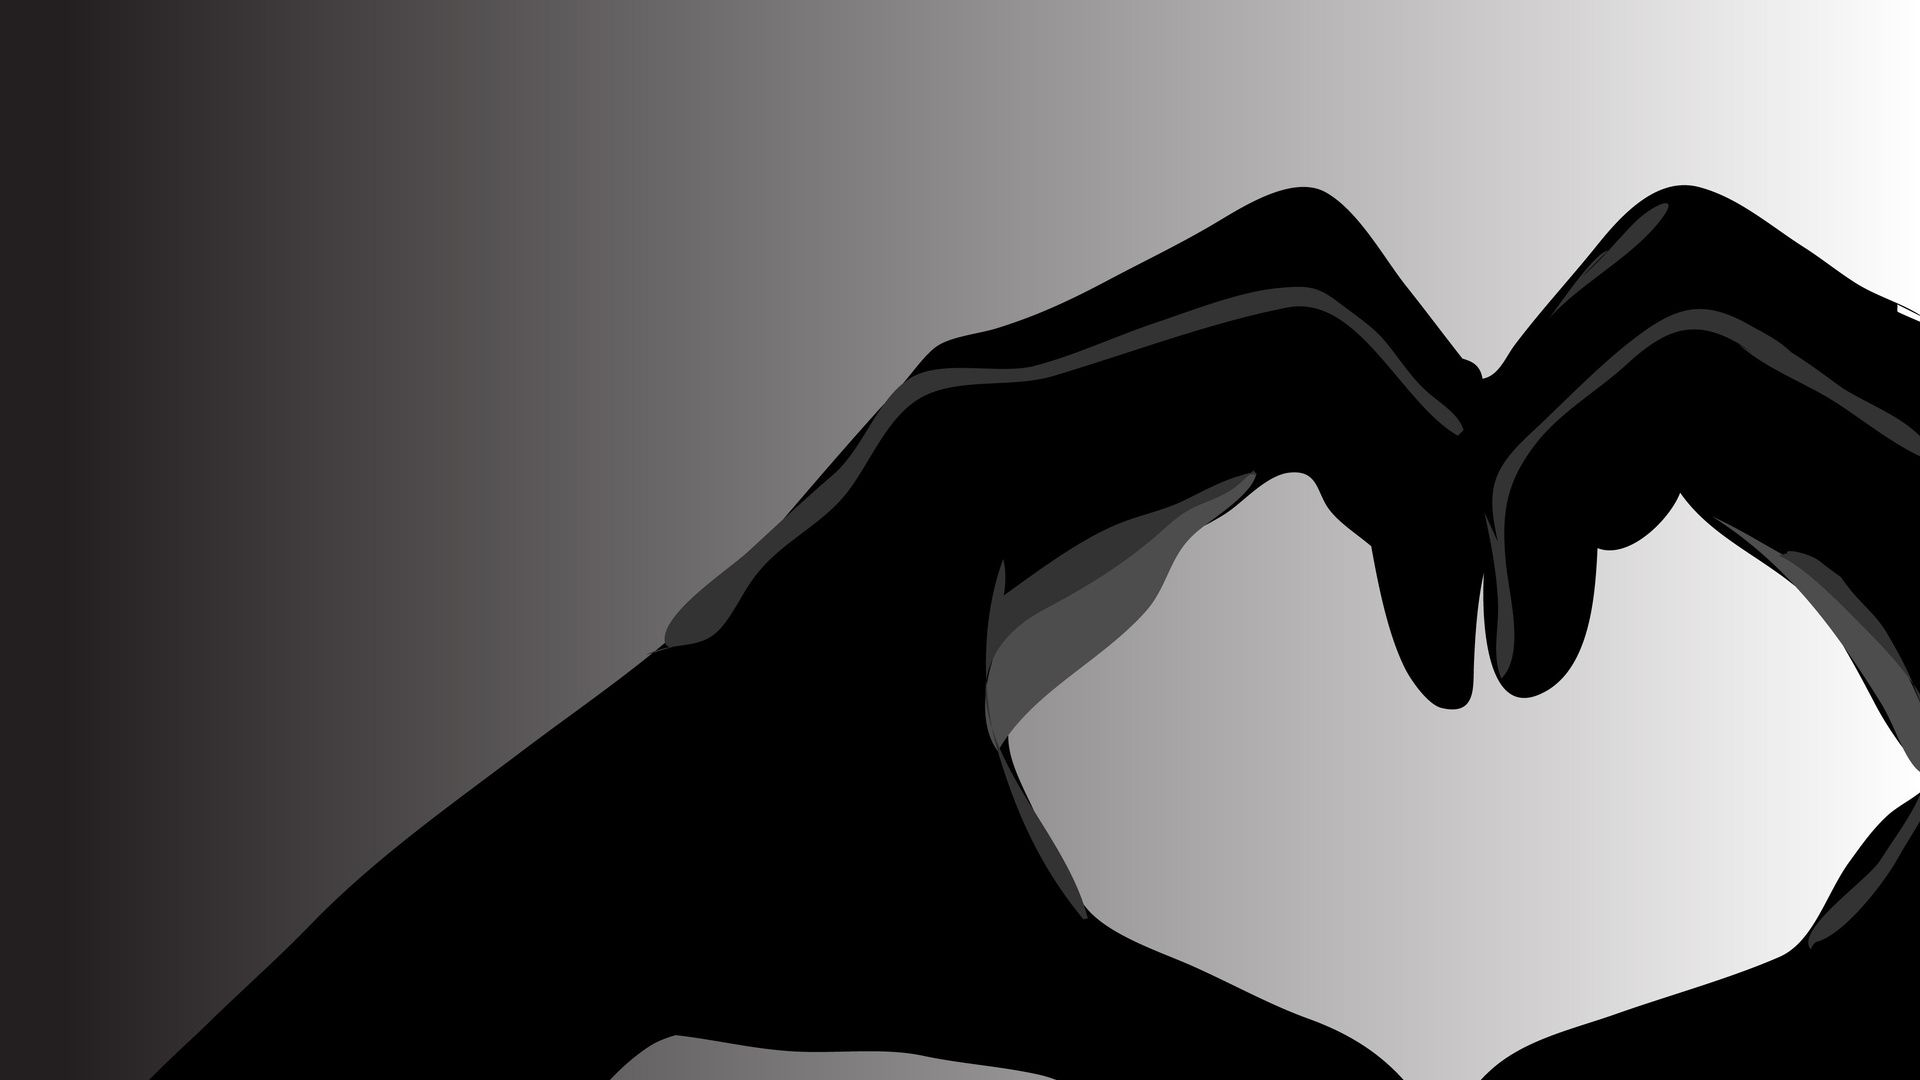 Black And White Love Wallpaper 2677 6765 Wallpaper Spotimg Black And White Love Love Wallpaper Black And White